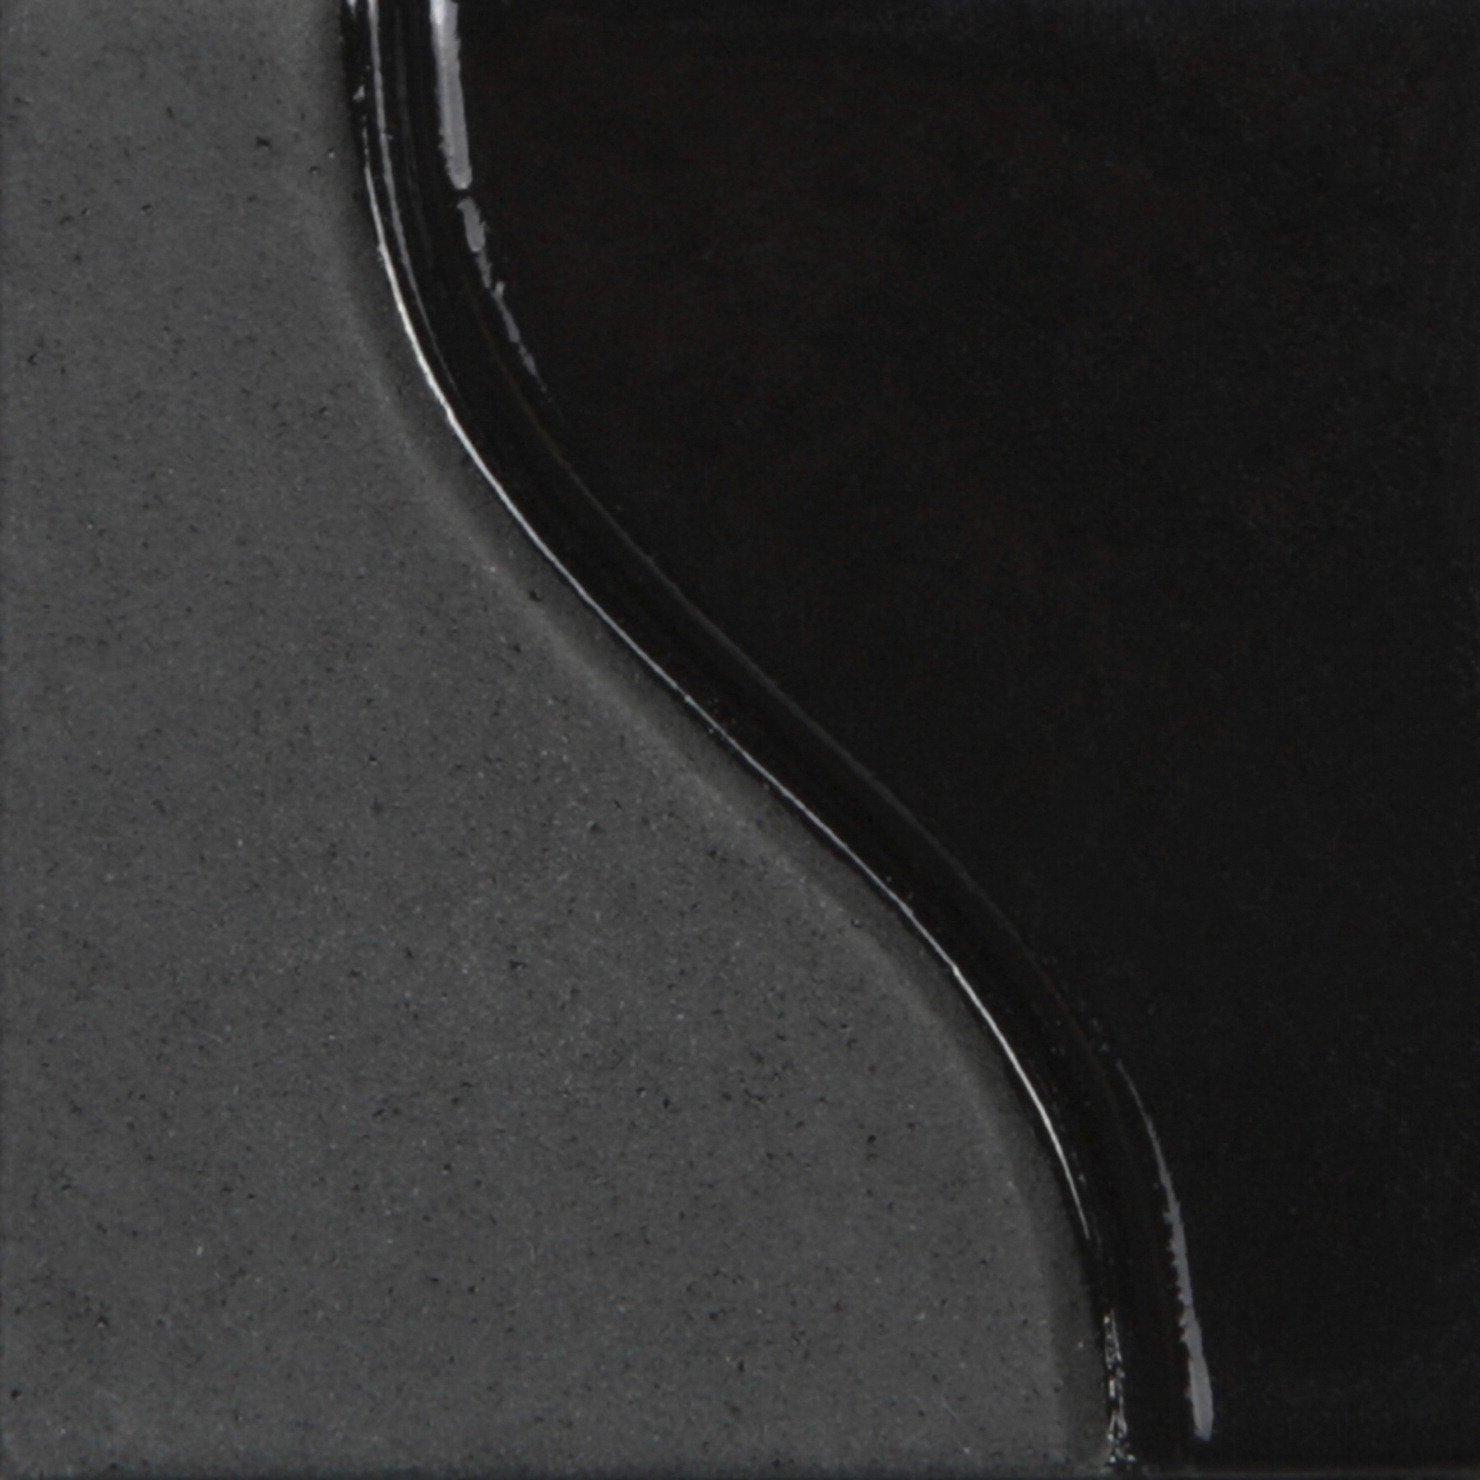 Sax True Flow Underglaze, Black, 1 Gallon by Sax